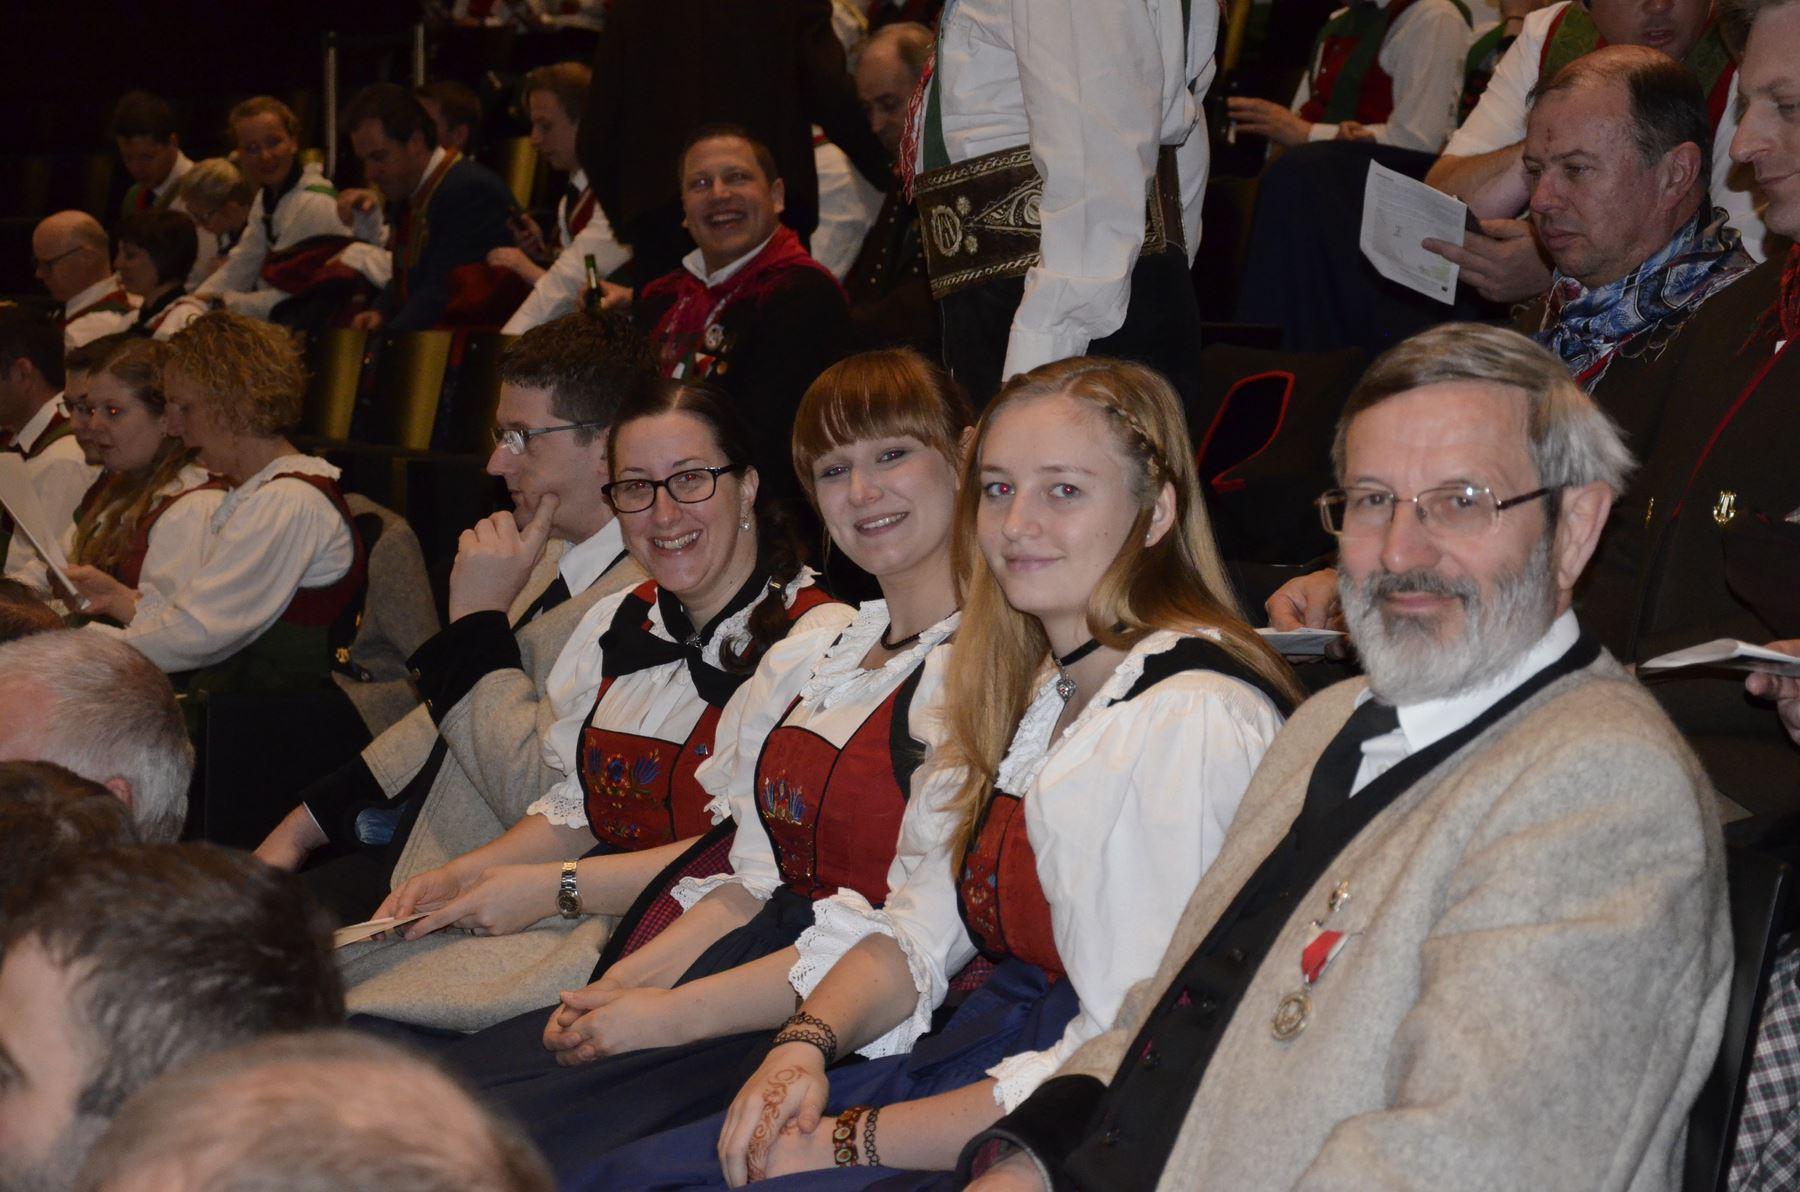 2017-03-12 Landesverbandsitzung Erl 004